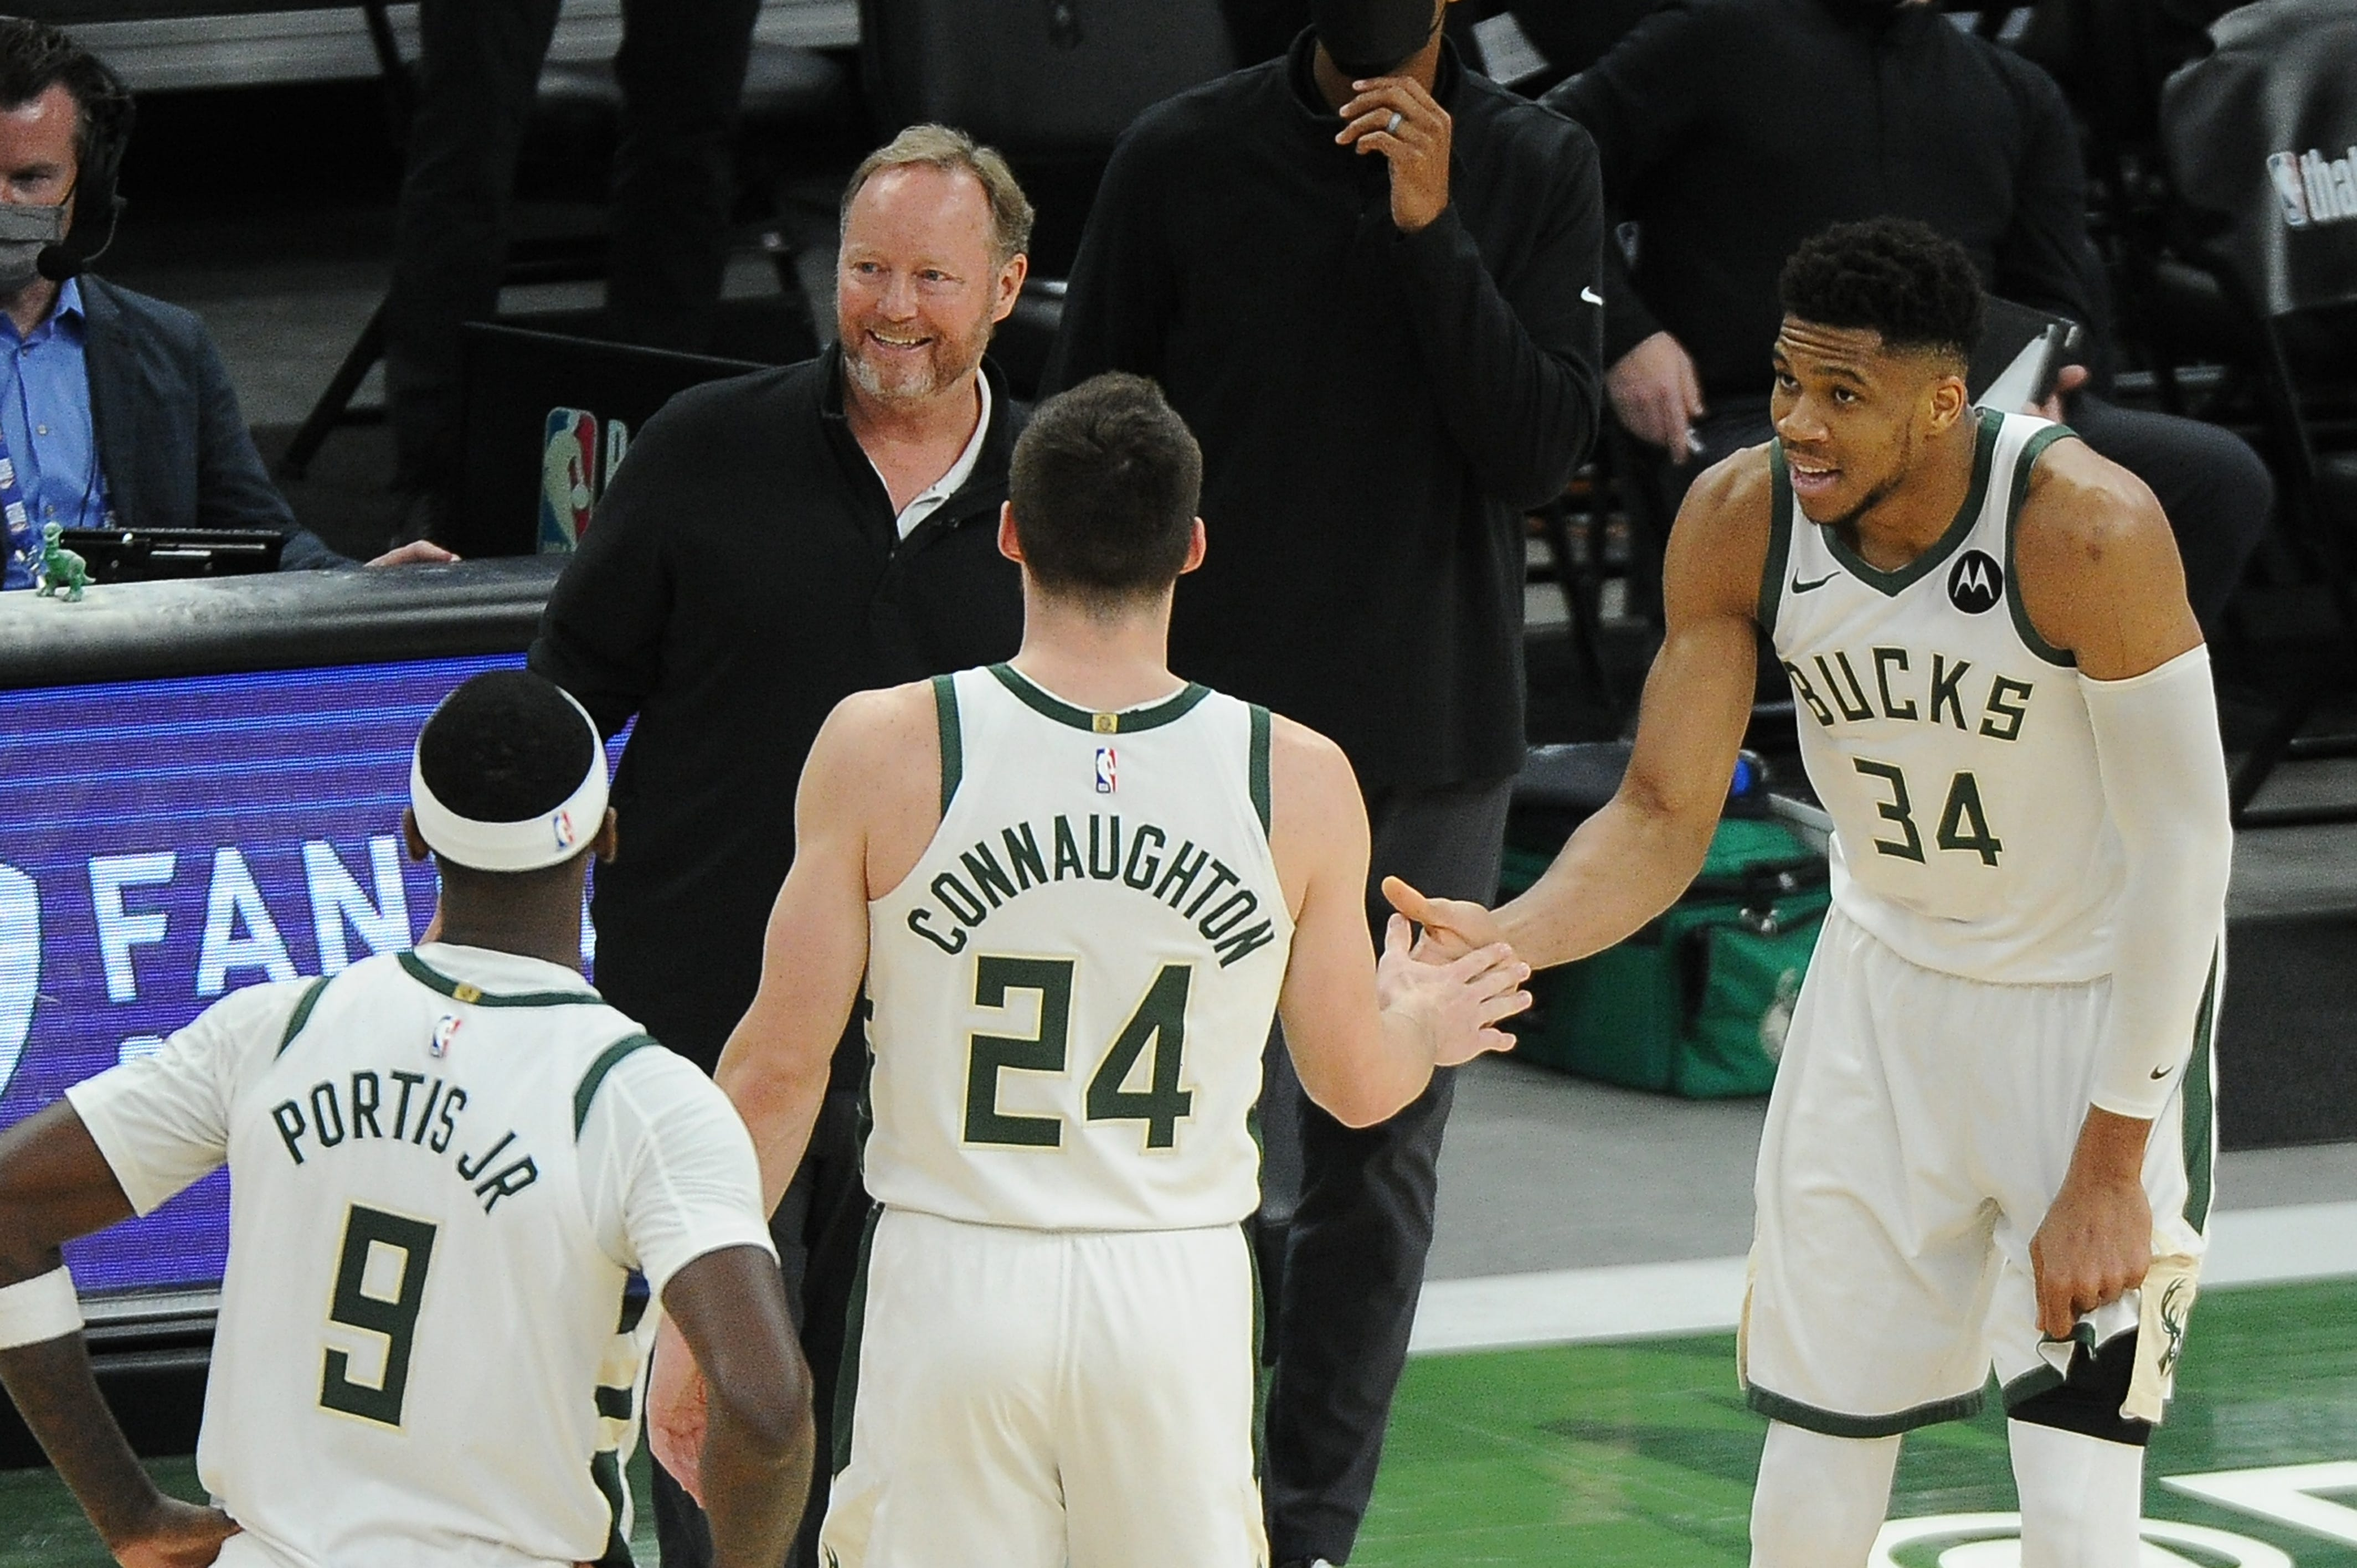 Are Milwaukee Bucks better prepared for making a long NBA playoff run?